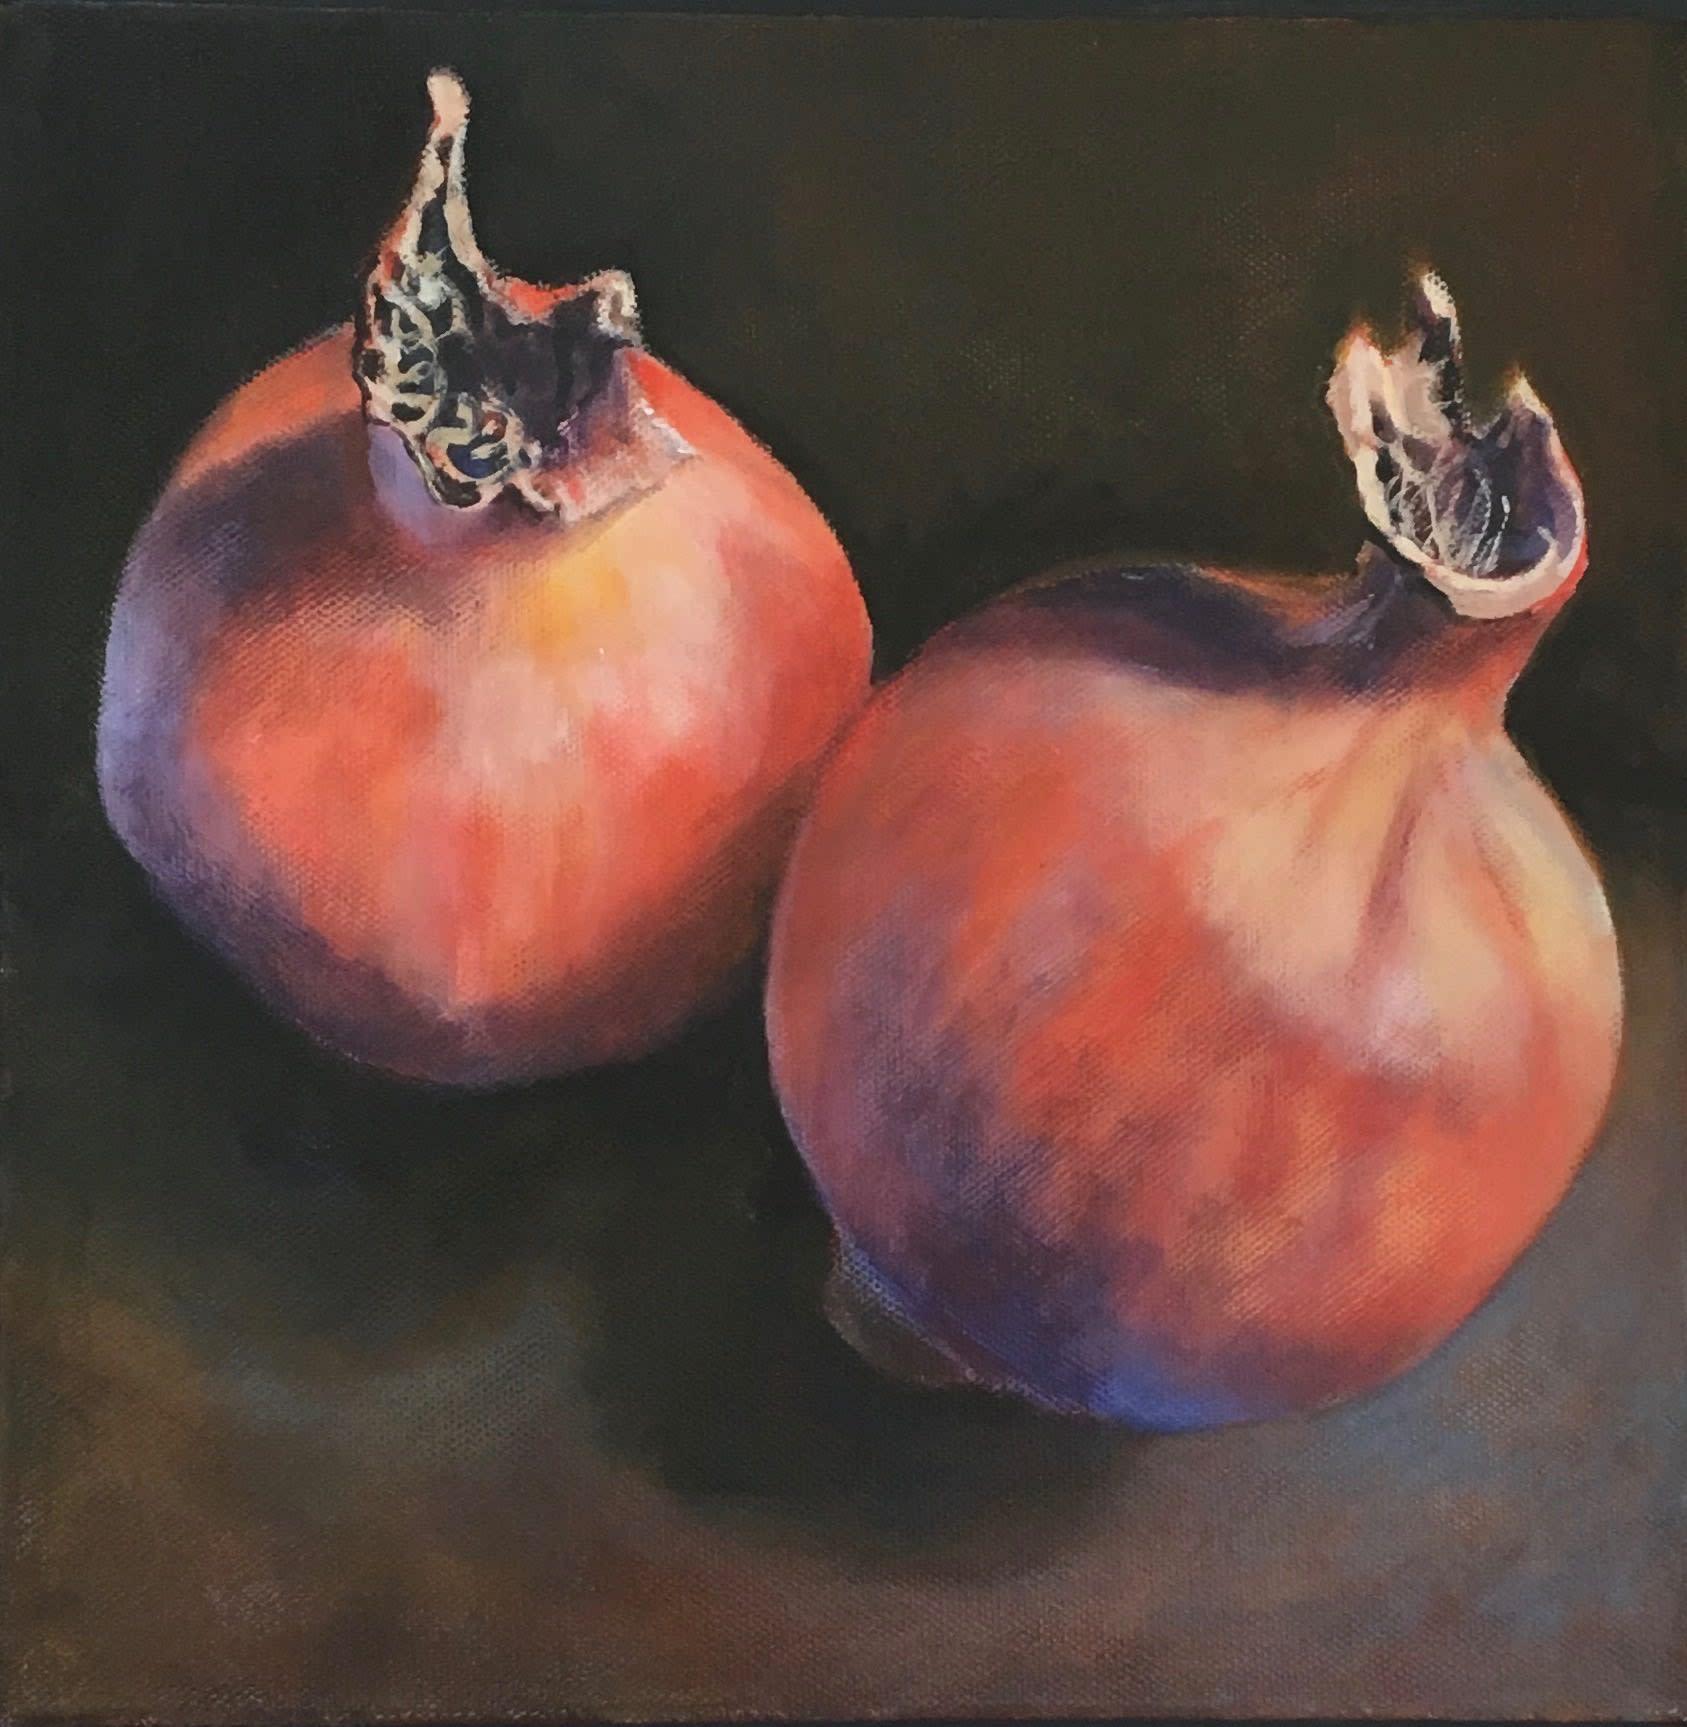 "<span class=""link fancybox-details-link""><a href=""/artists/34-joyce-pinch/works/2961-joyce-pinch-pomegranates/"">View Detail Page</a></span><div class=""artist""><strong>Joyce Pinch</strong></div> <div class=""title""><em>Pomegranates</em></div> <div class=""medium"">Acrylic on Canvas</div> <div class=""dimensions"">40 x 40 cm </div><div class=""price"">£500.00</div>"